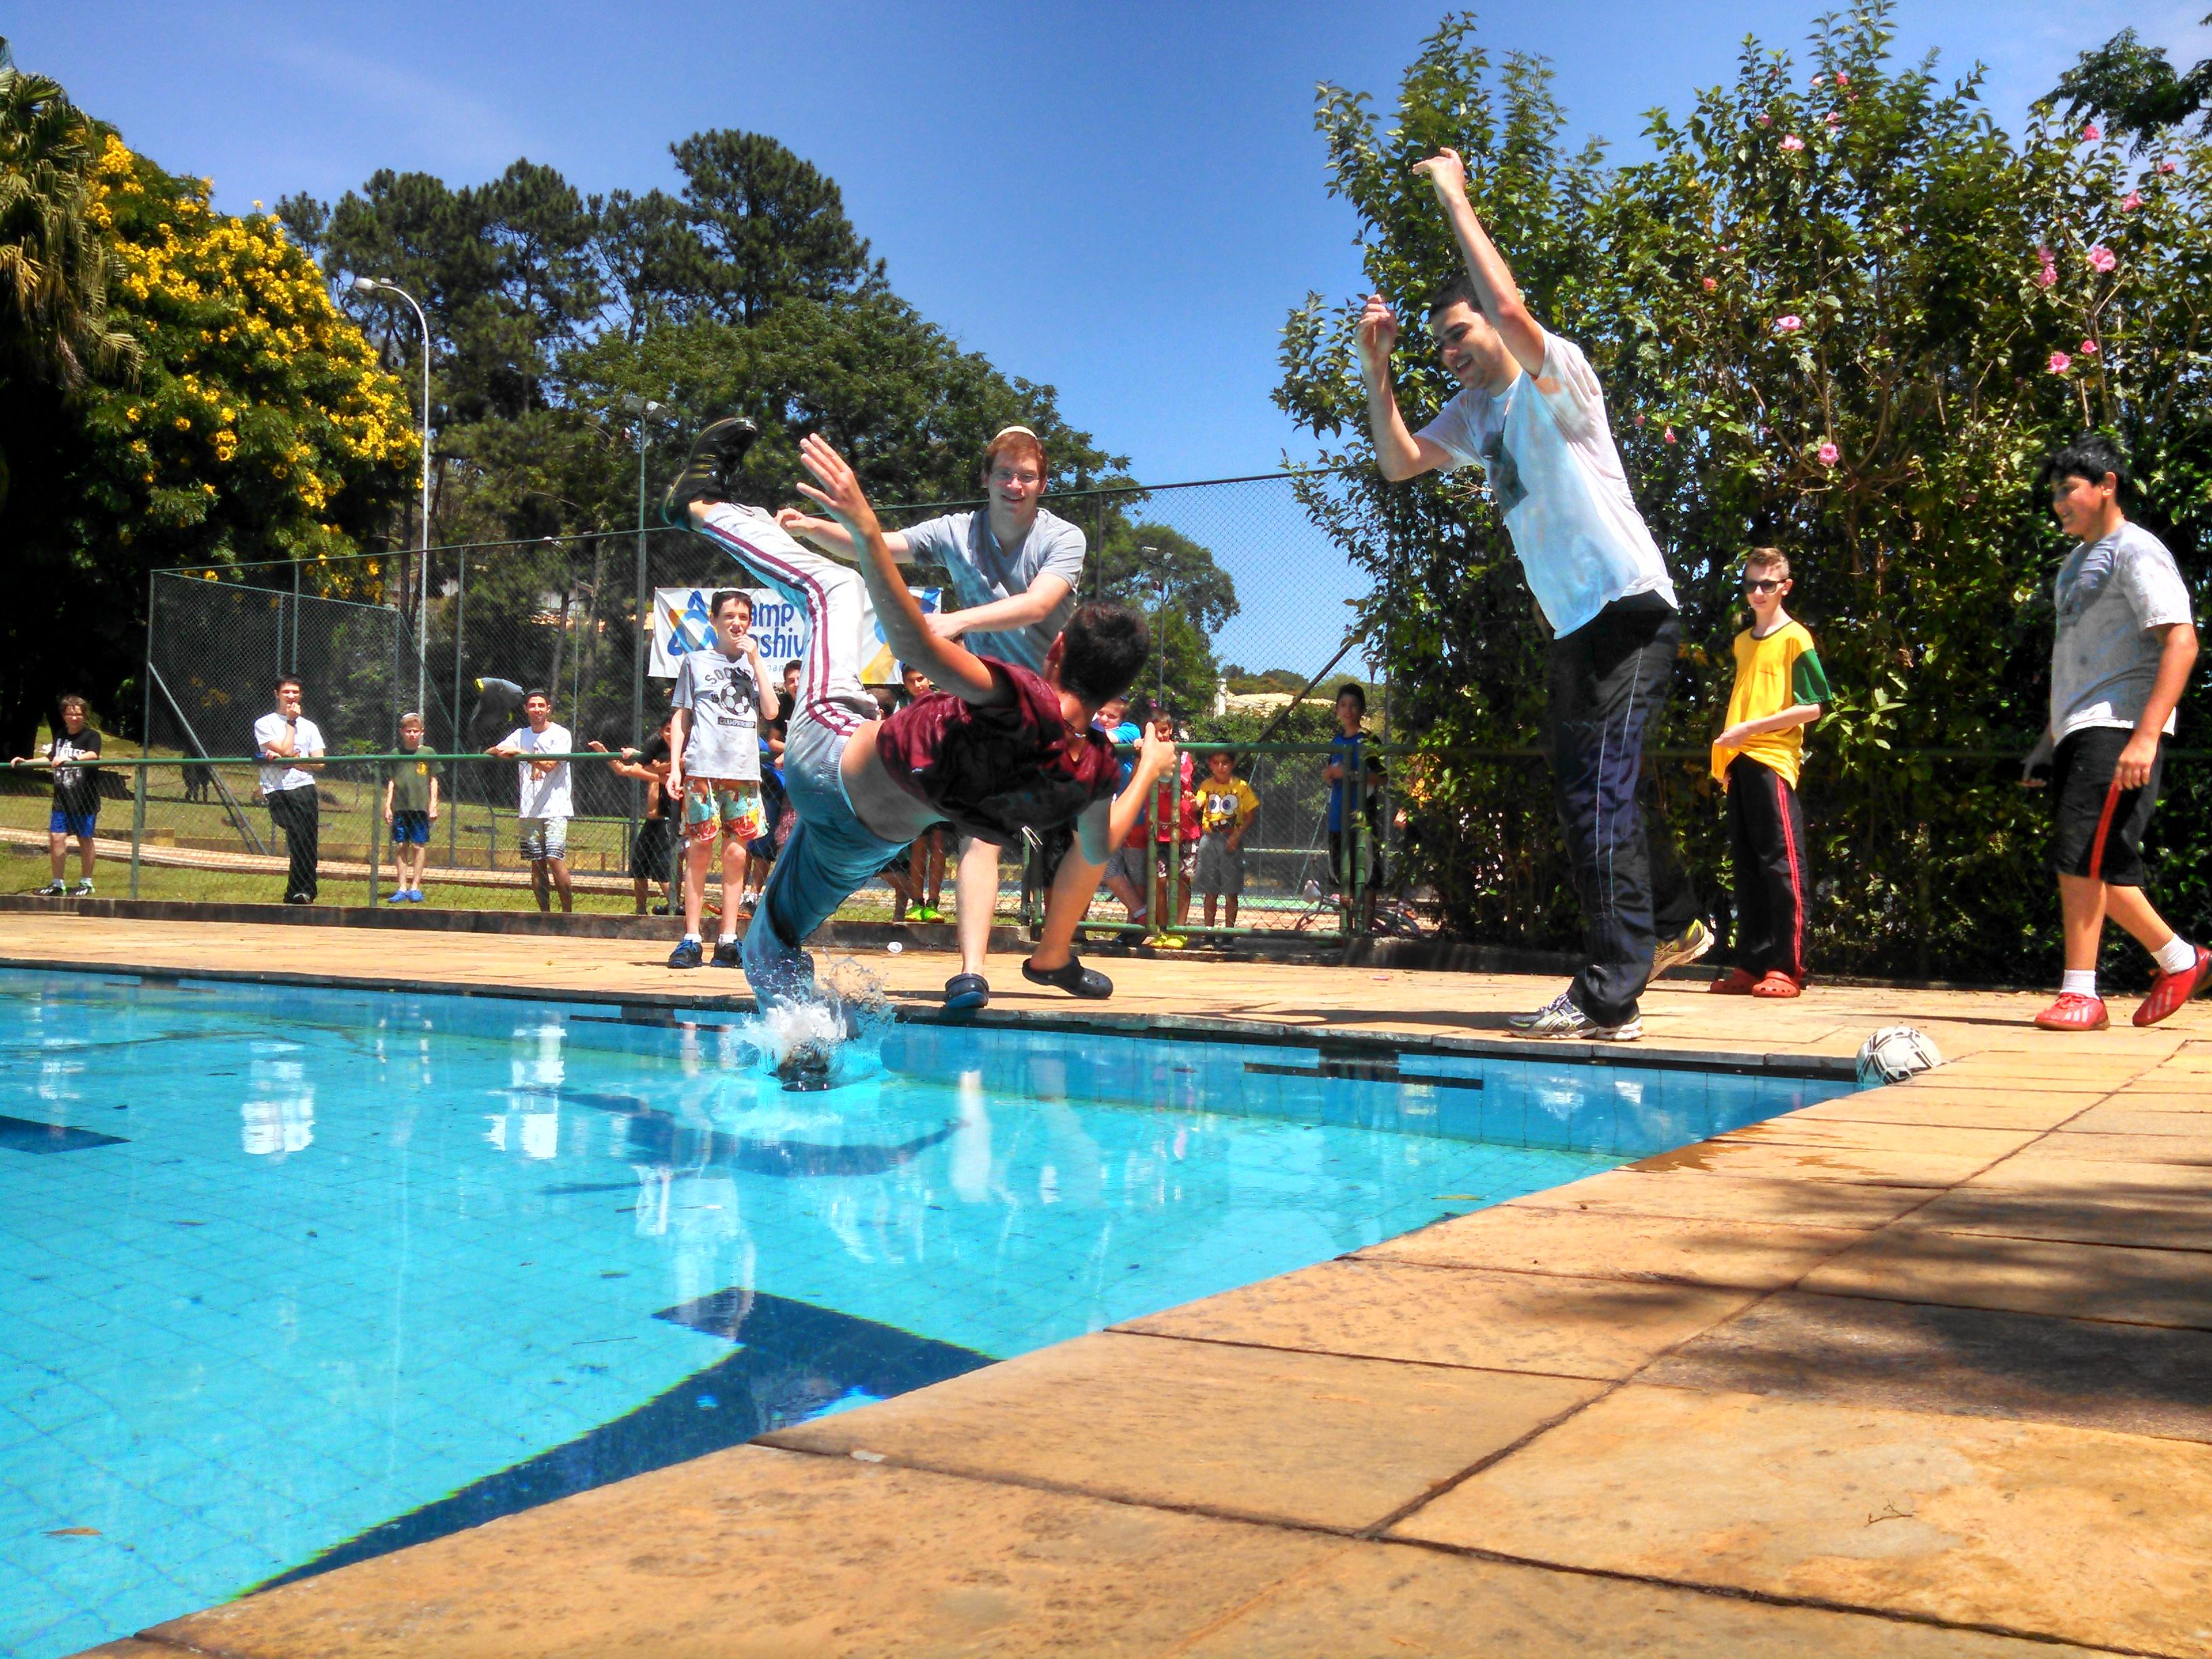 Madrichim jogando chanich na piscina